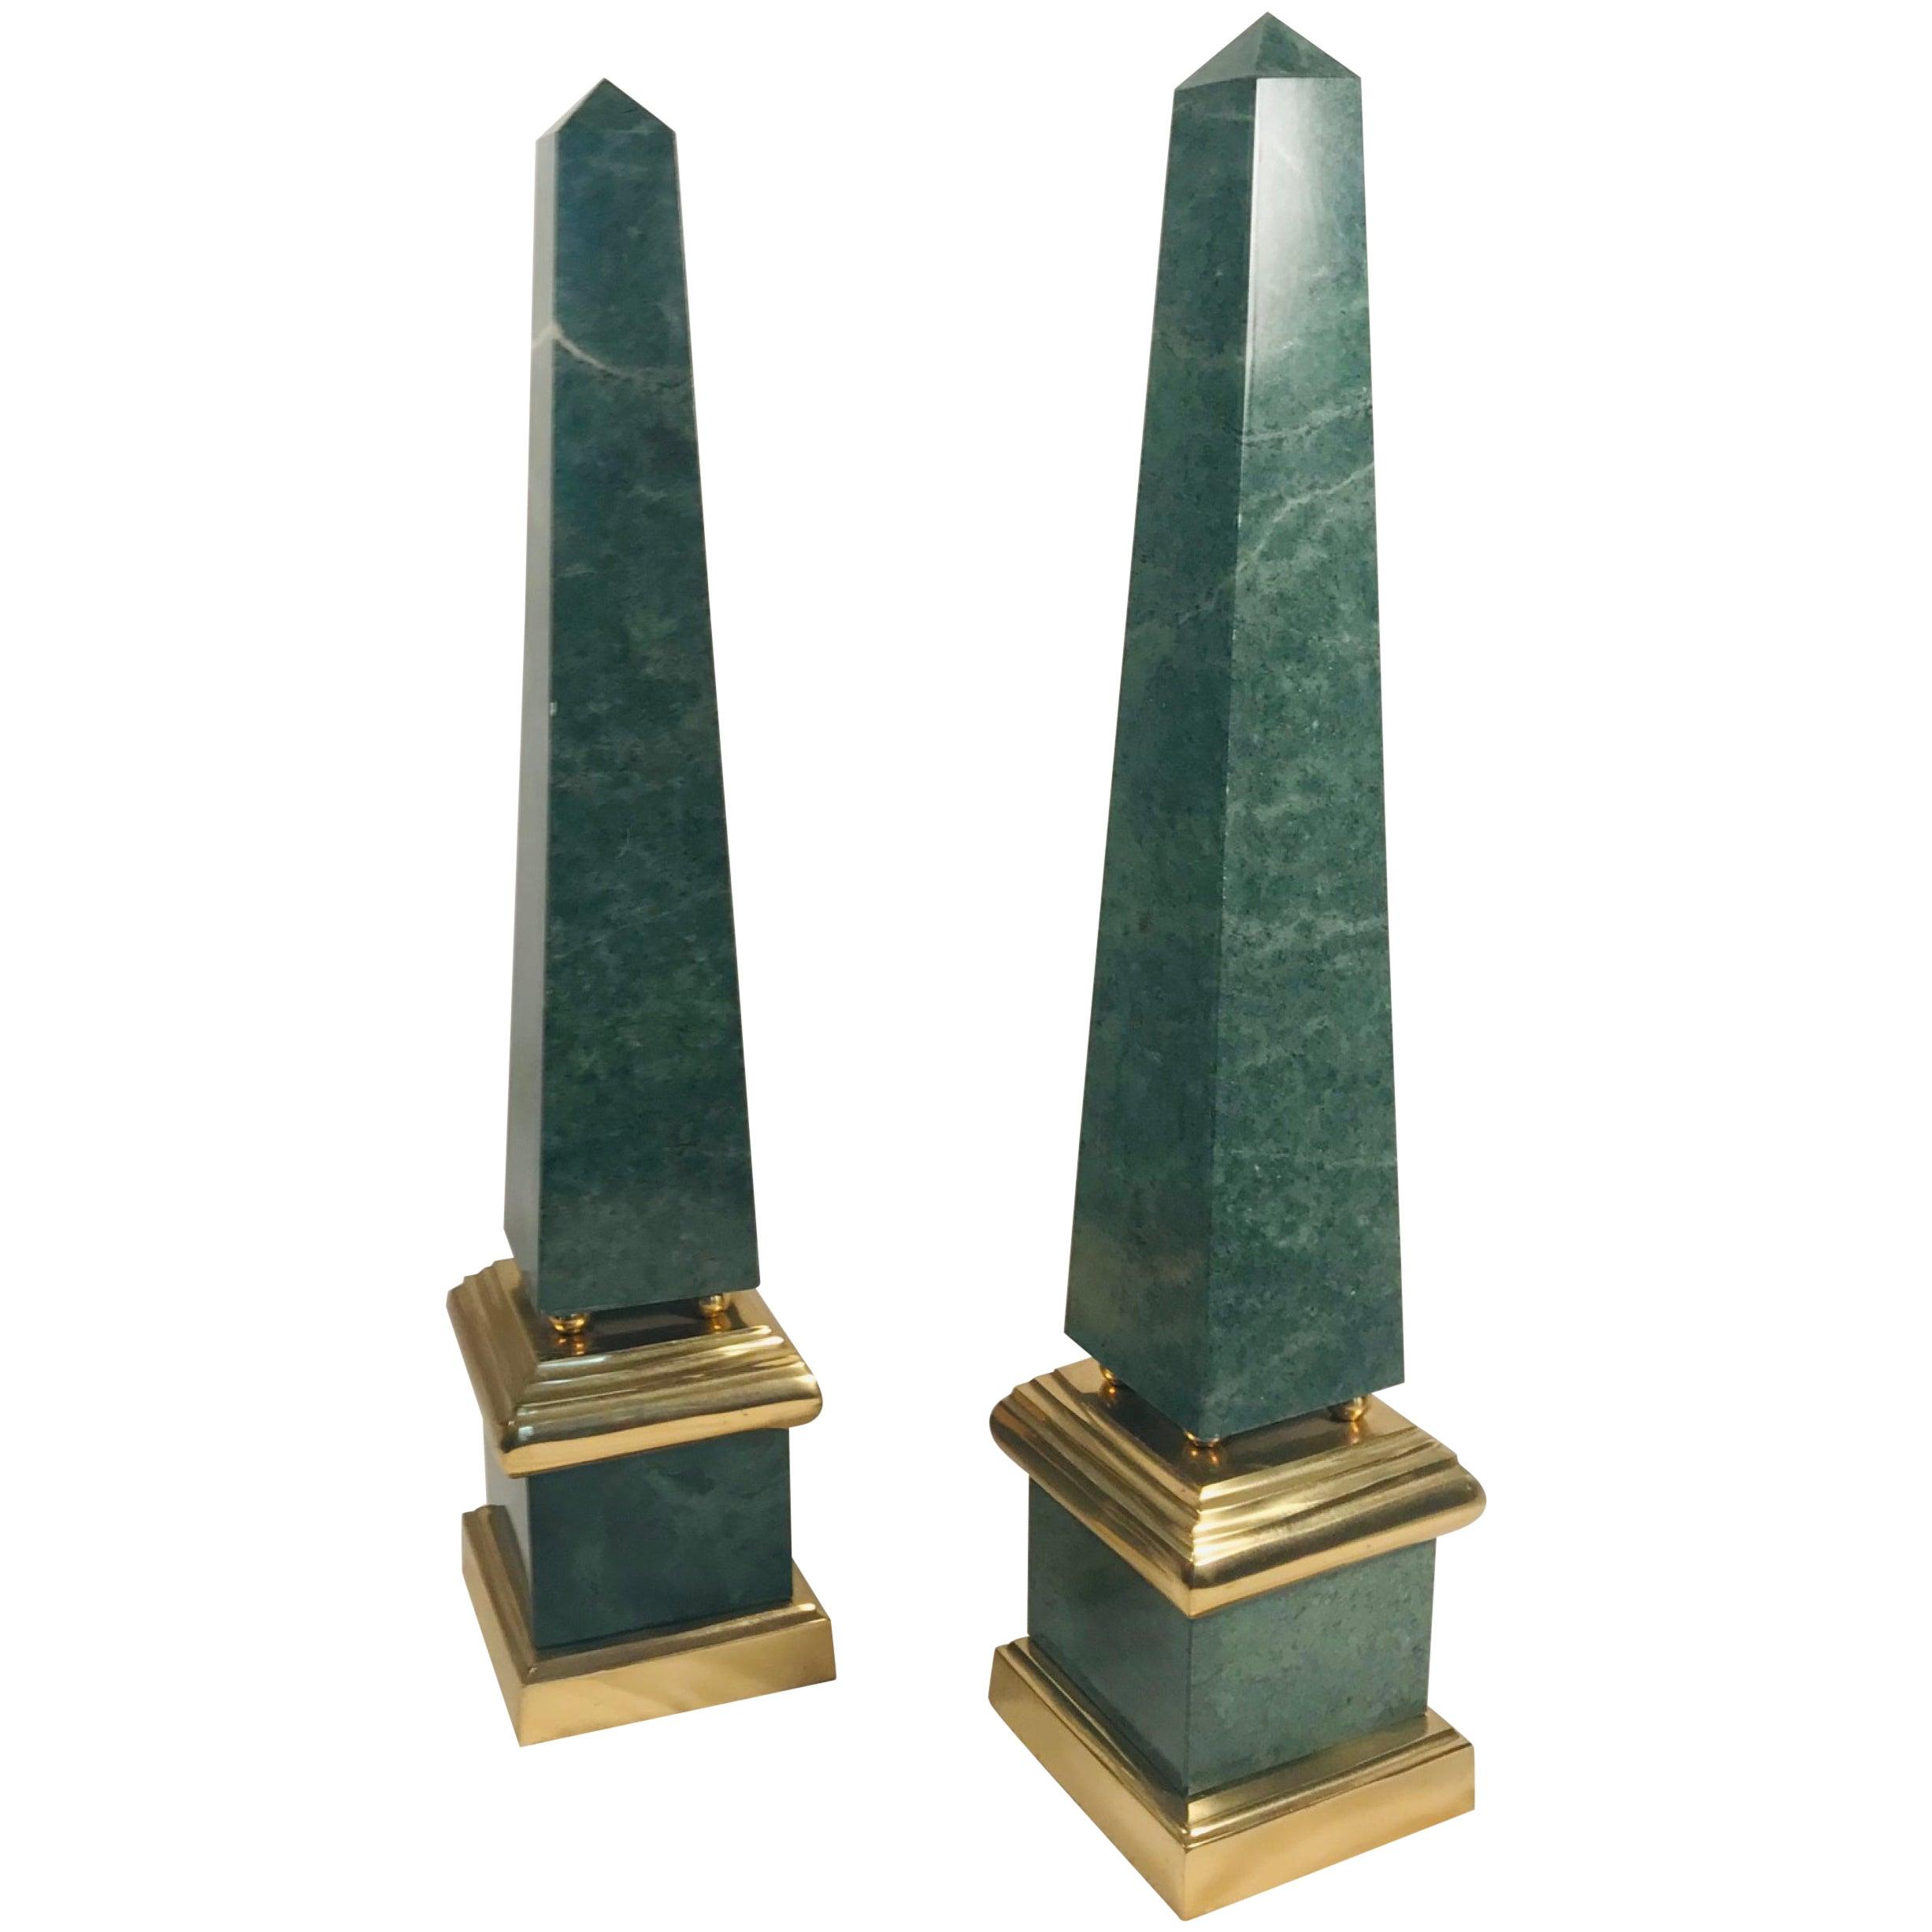 Pair of Vintage Large Green Obelisks, Brass Mounted